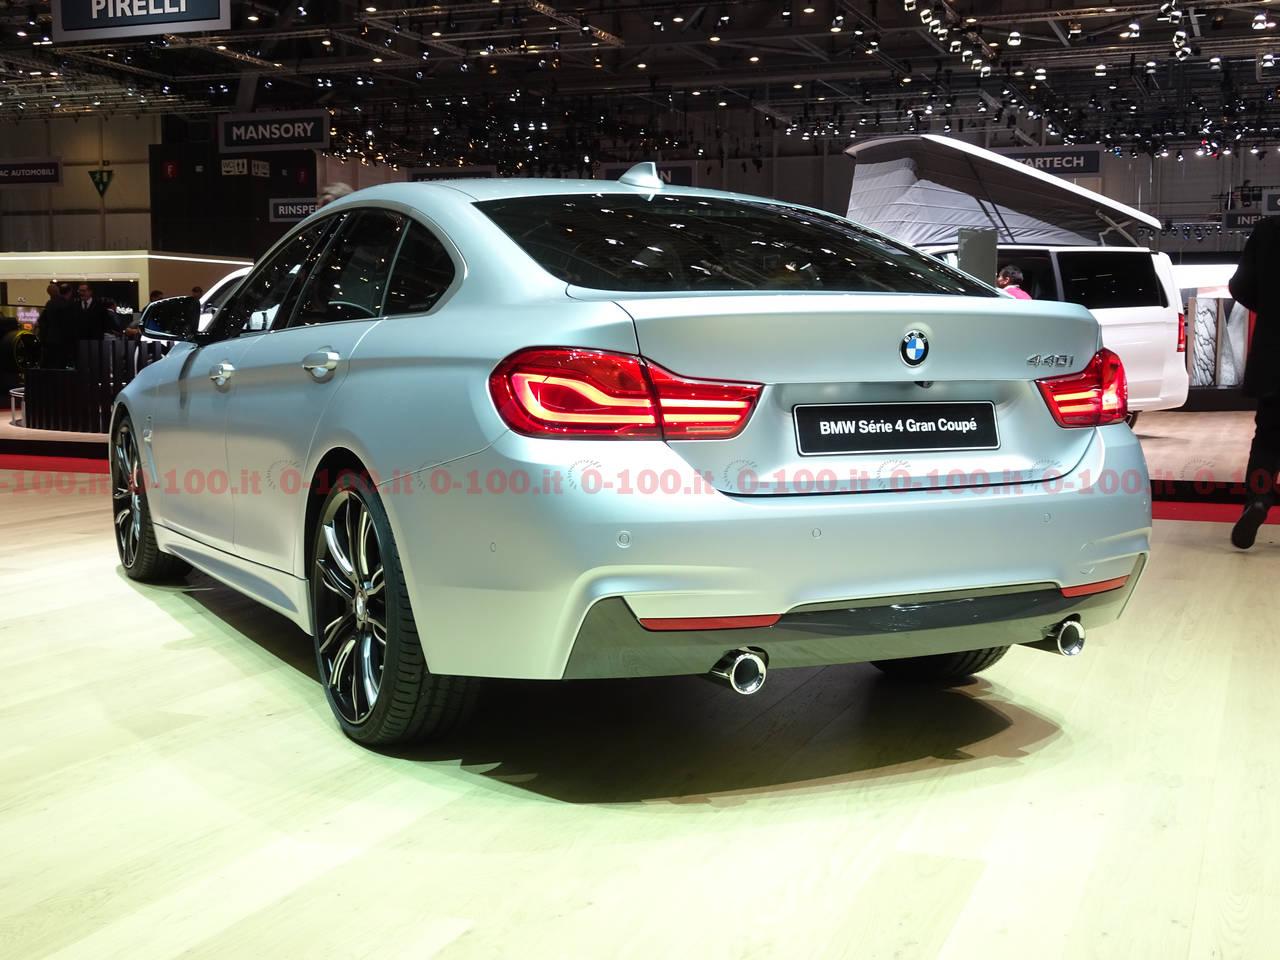 Ginevra-geneva-geneve-2017-BMW_Serie-4-gran-coupe_0-100_1